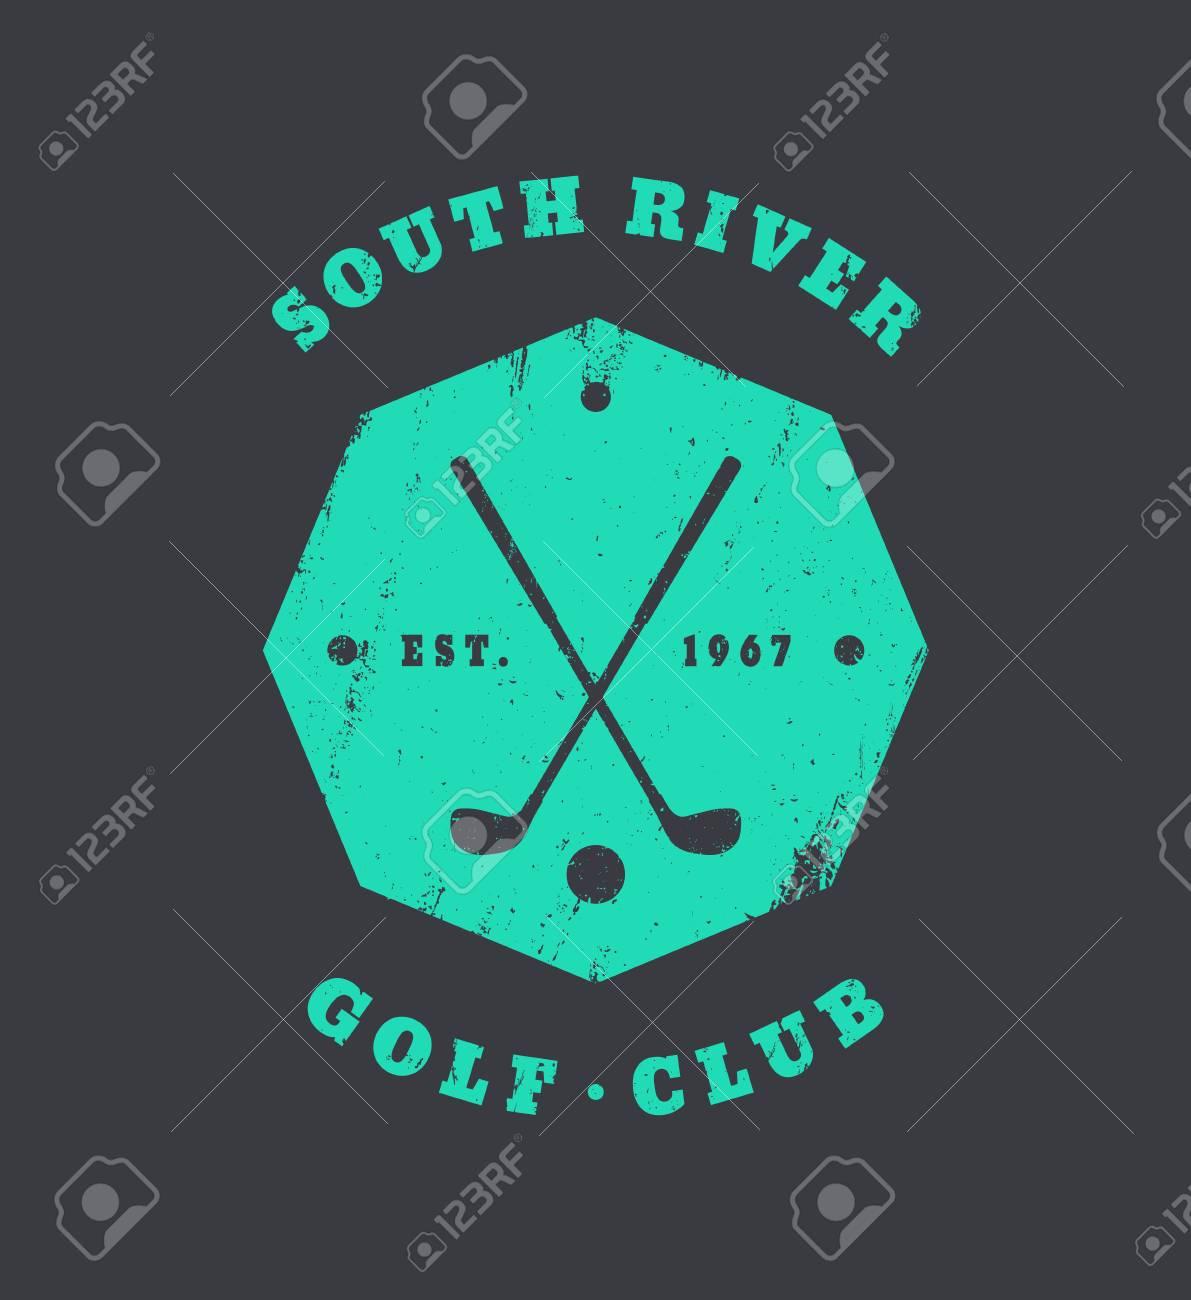 Golf Club Grunge Vintage Octagonal Emblem, Logo, Badge With Crossed Golf Clubs Crossed Logo Design on golf t-shirt logo design, baseball skull tattoo design, golf club embroidery design,